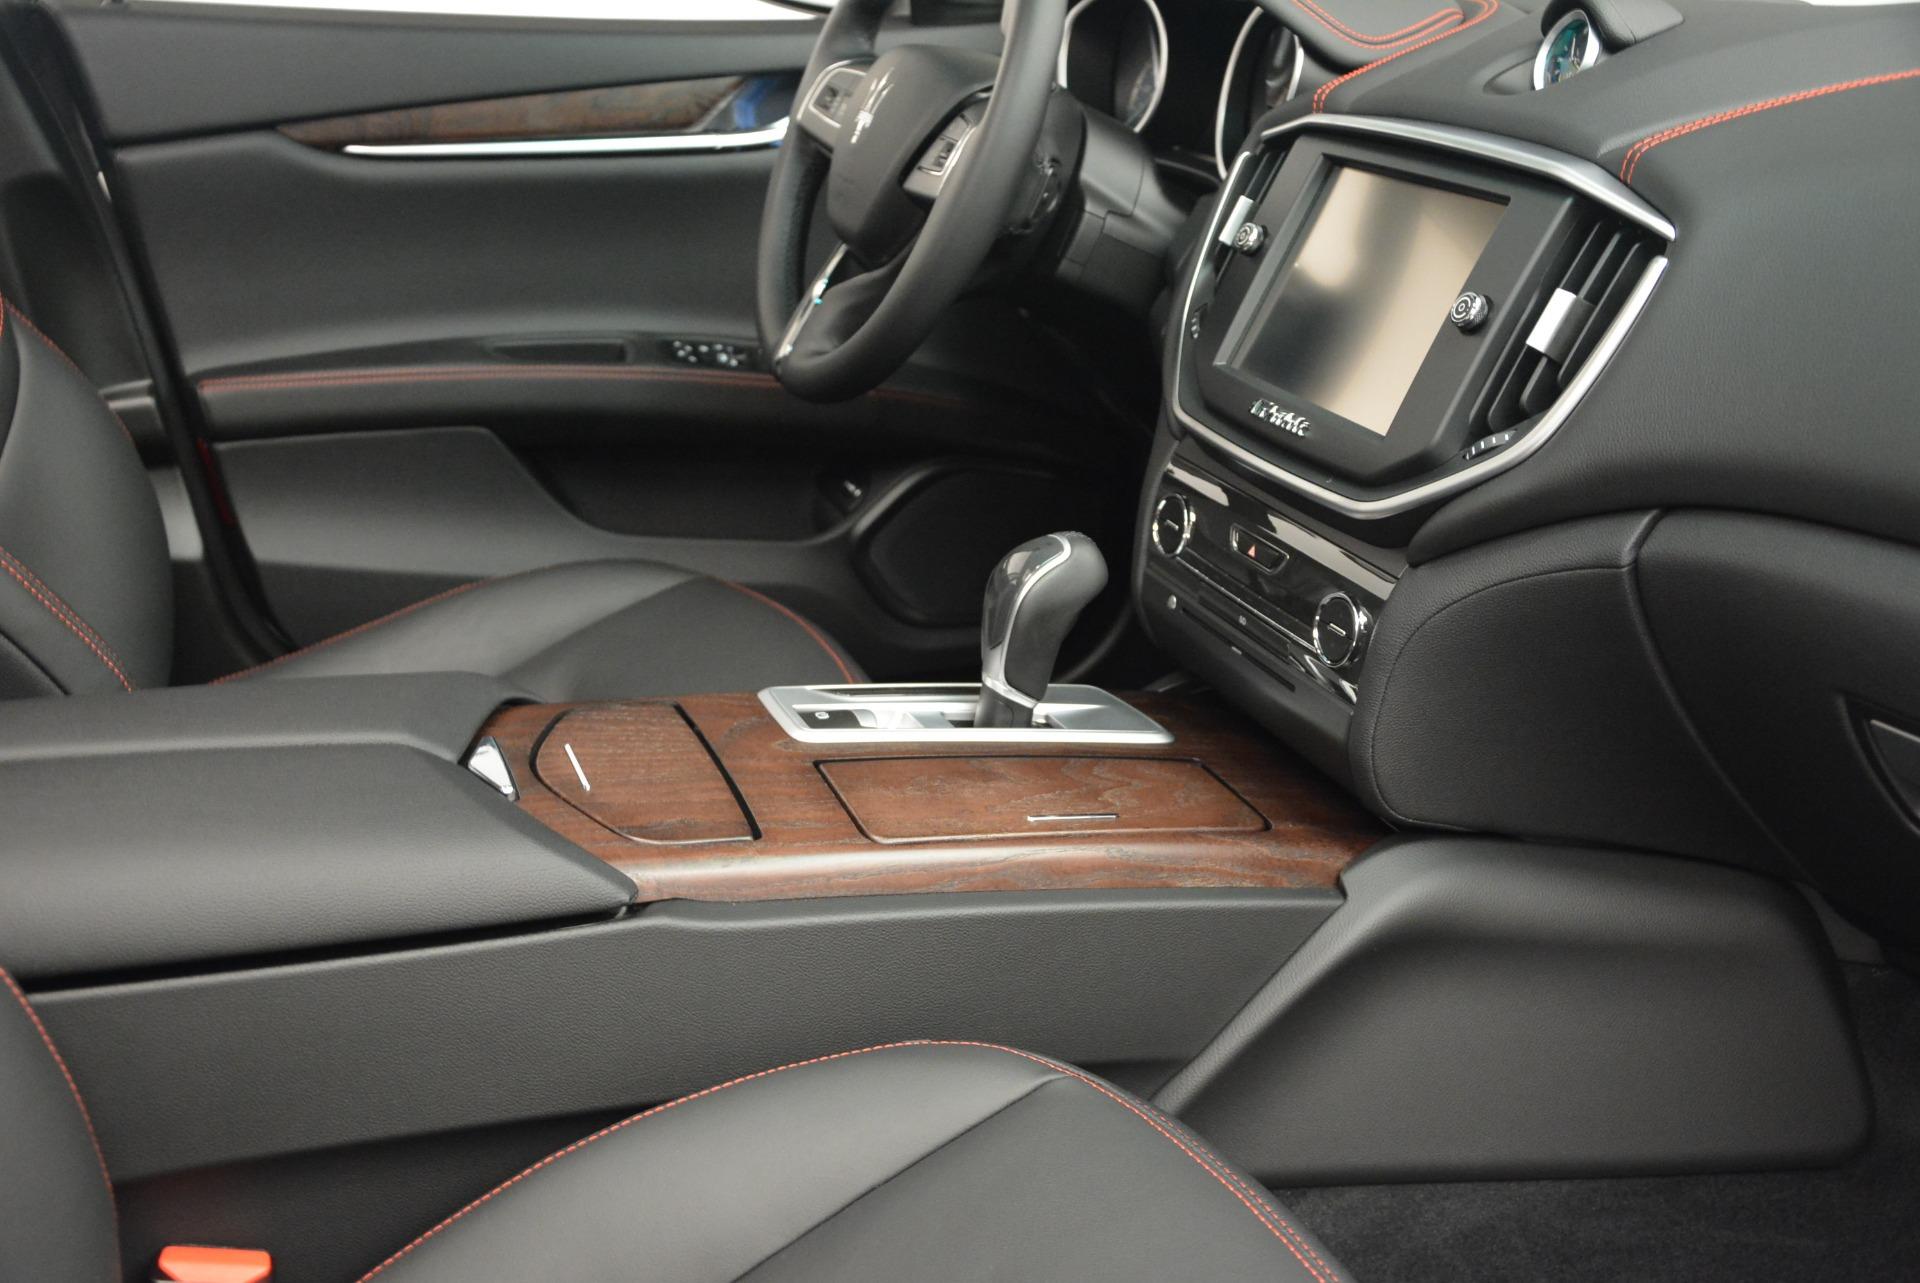 Used 2016 Maserati Ghibli S Q4  EX-LOANER For Sale In Greenwich, CT. Alfa Romeo of Greenwich, W252 669_p19